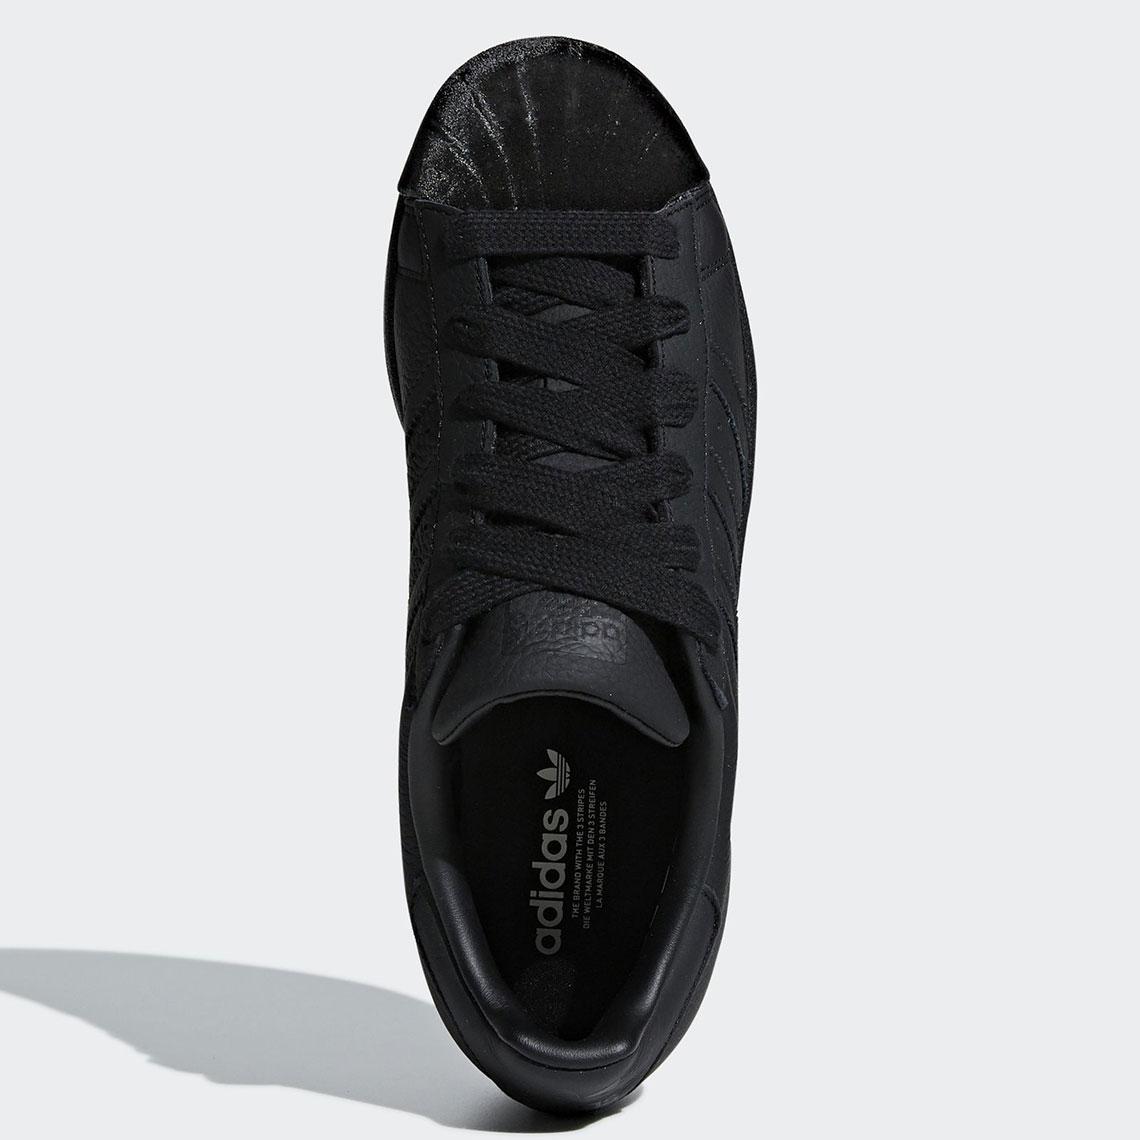 adidas superstar matte black